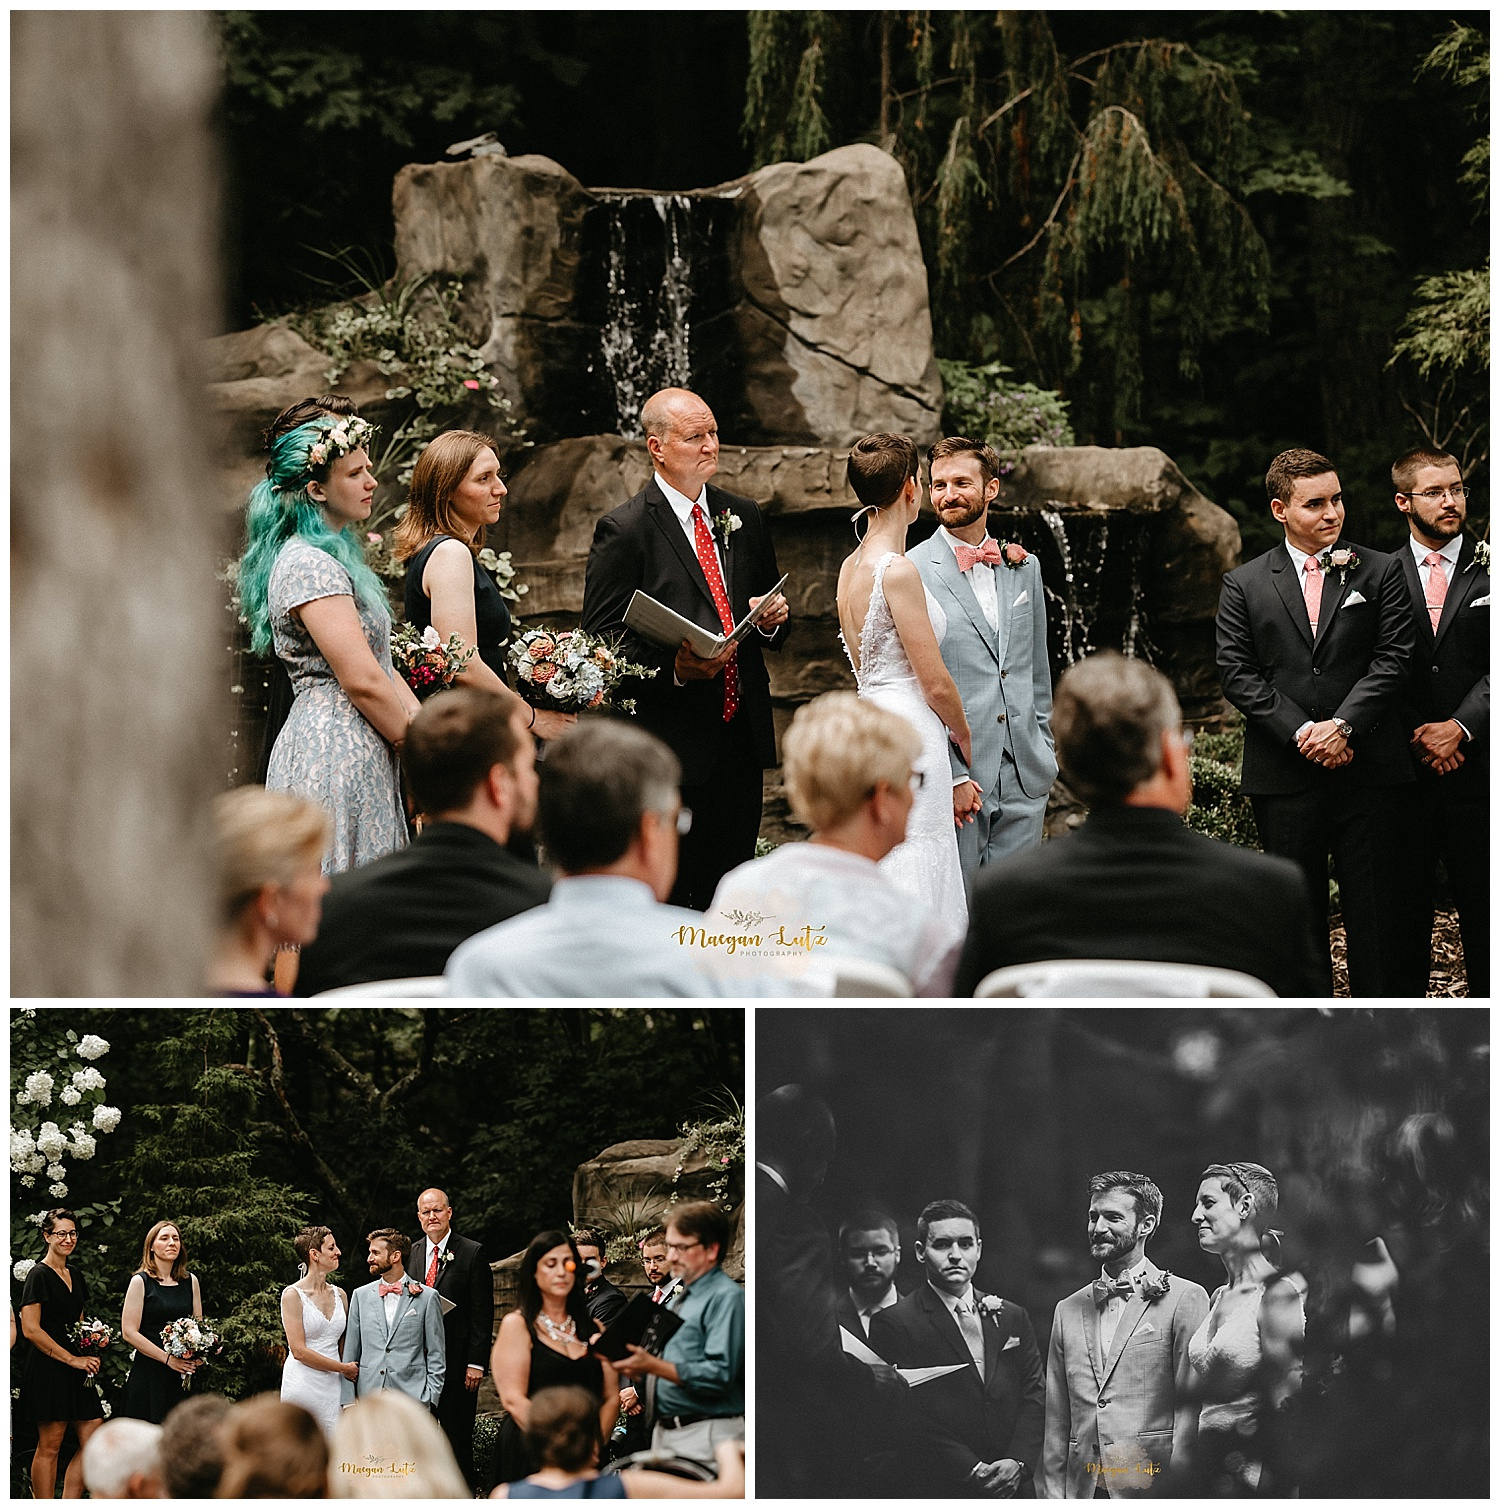 NEPA-Wedding-Photographer-at-Carmens-Country-Inn-and-Gardens-Drums-PA_0019.jpg